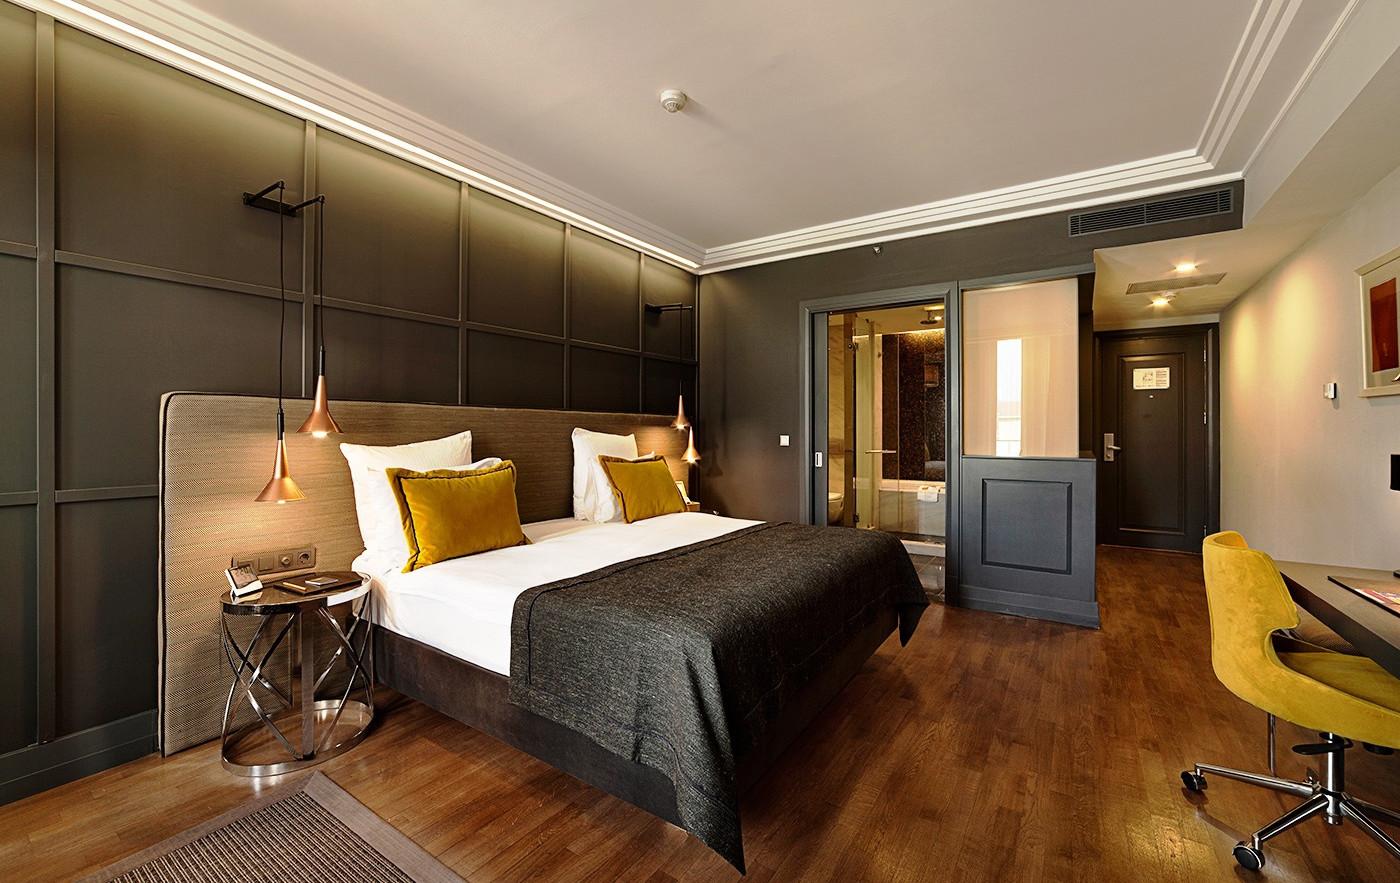 sofa_hotel_nisantasi_15.jpg